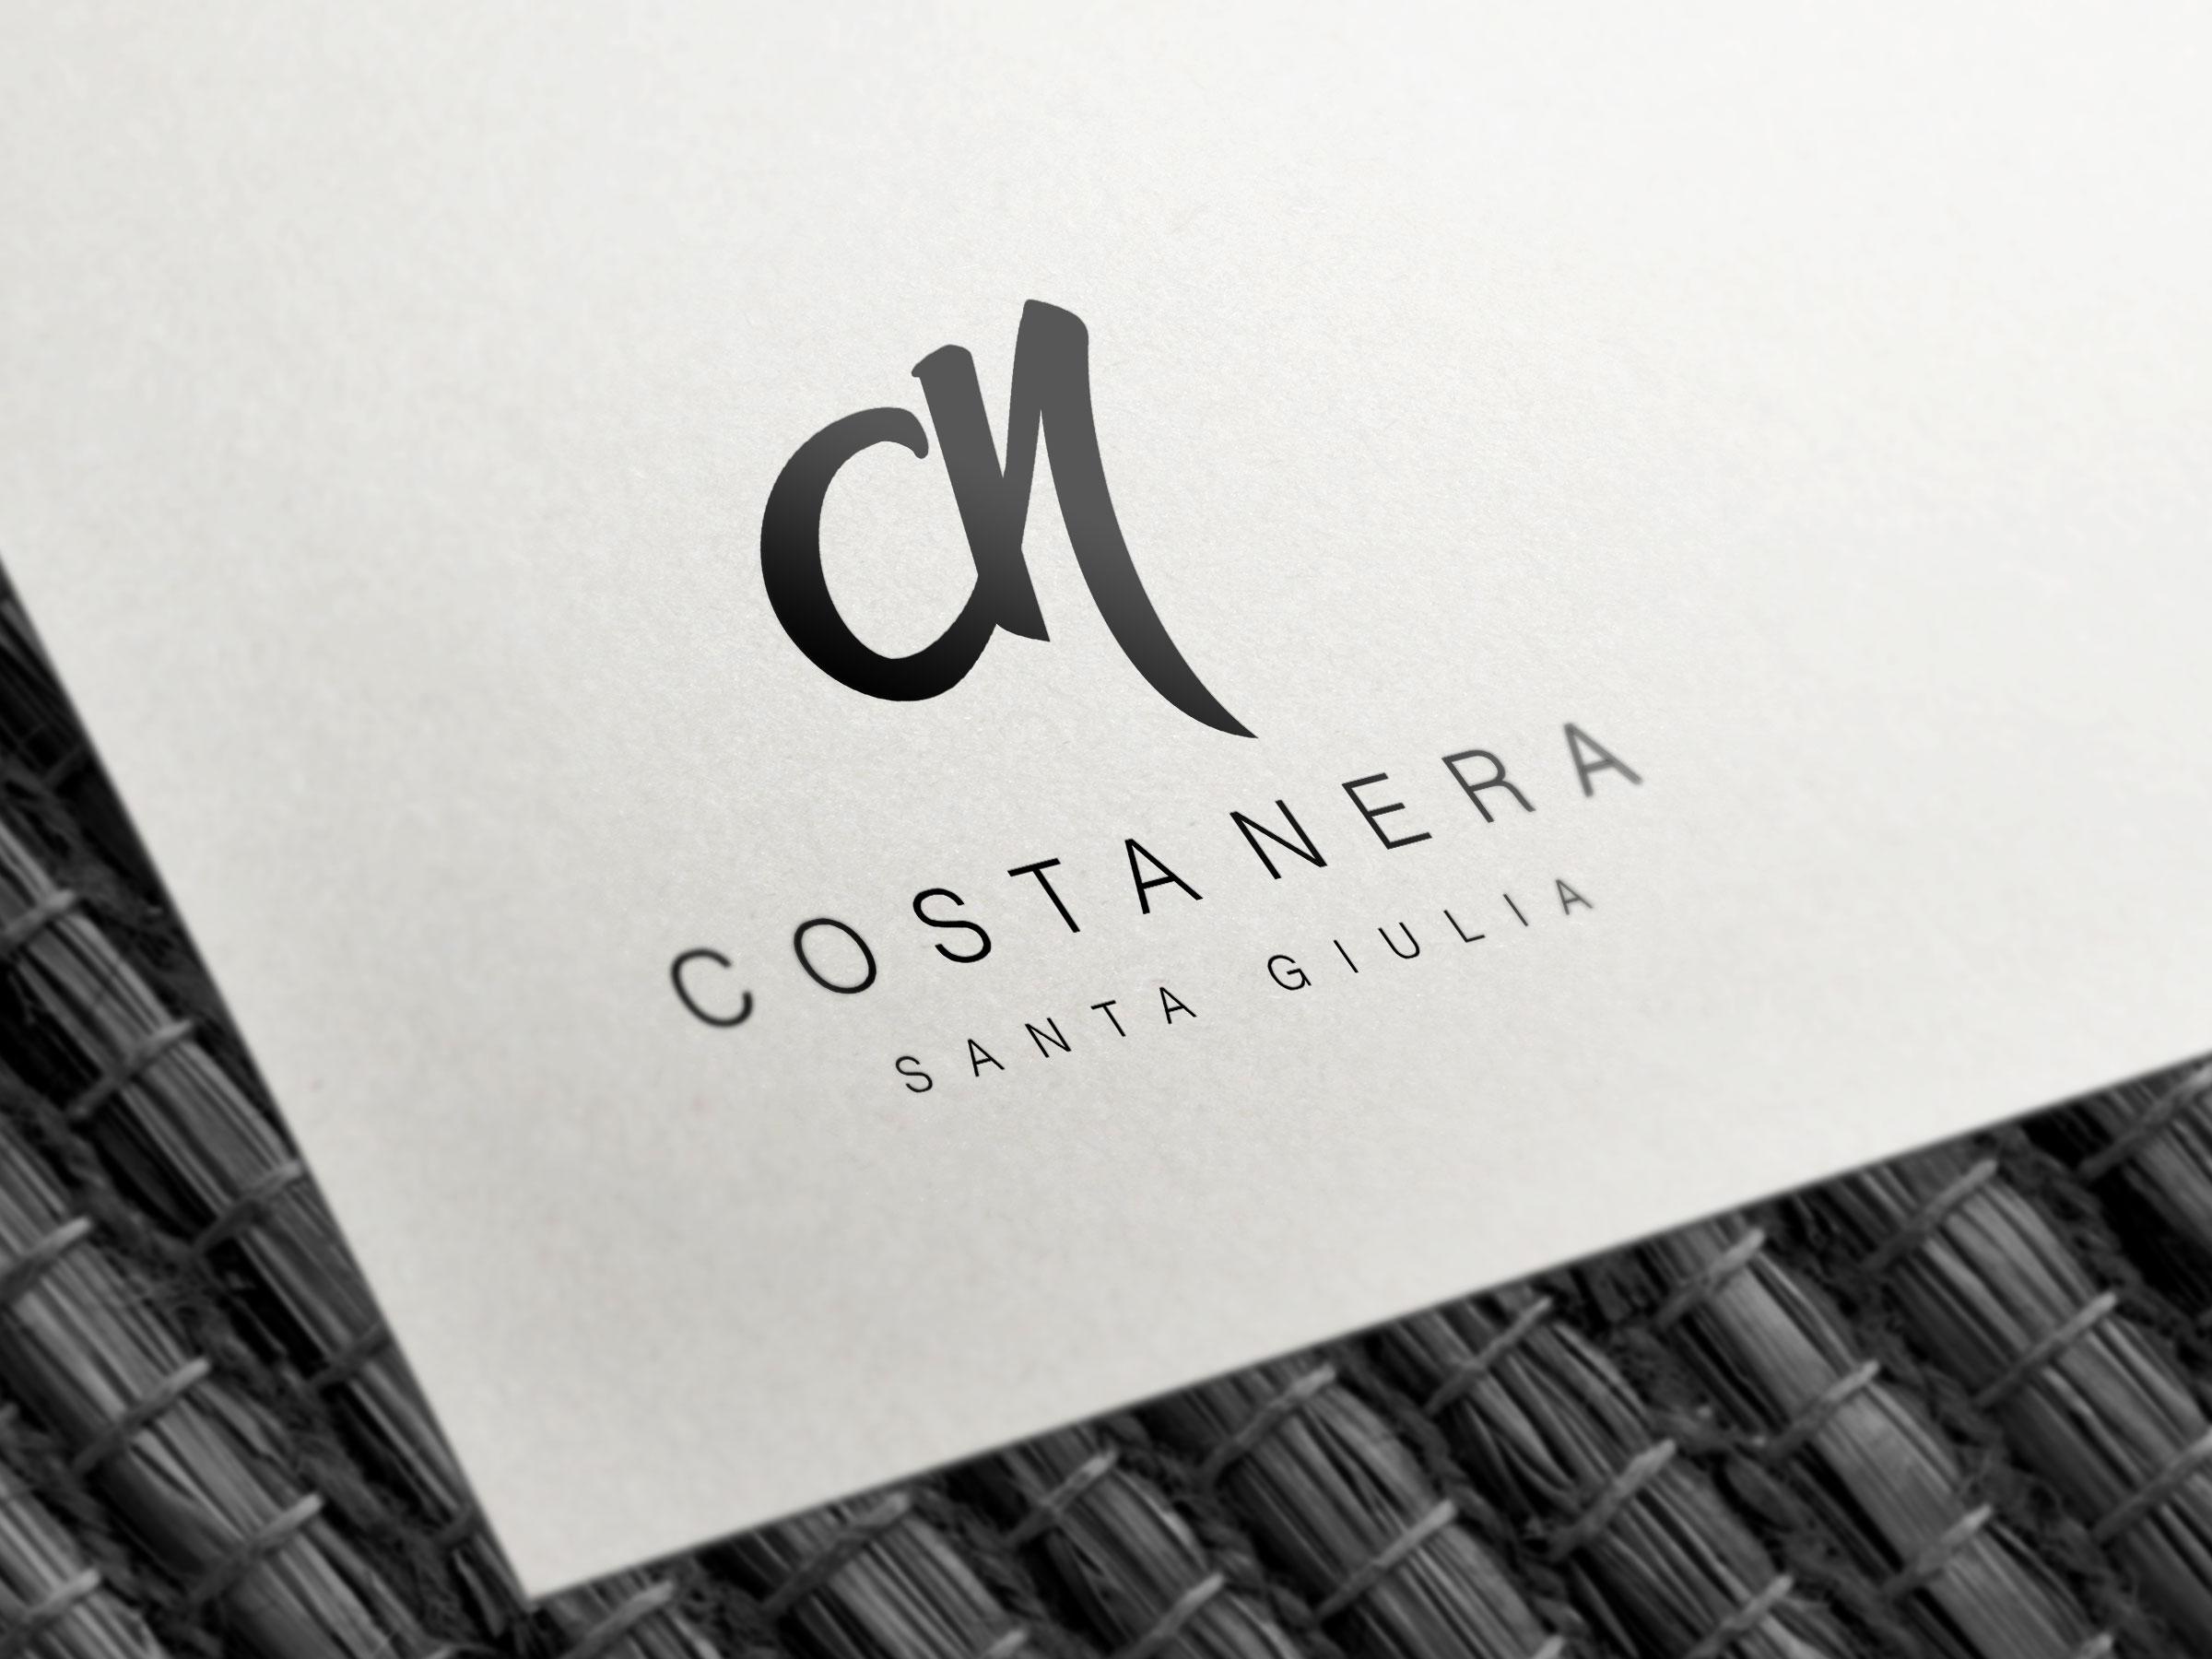 Création de logos et branding costa nera